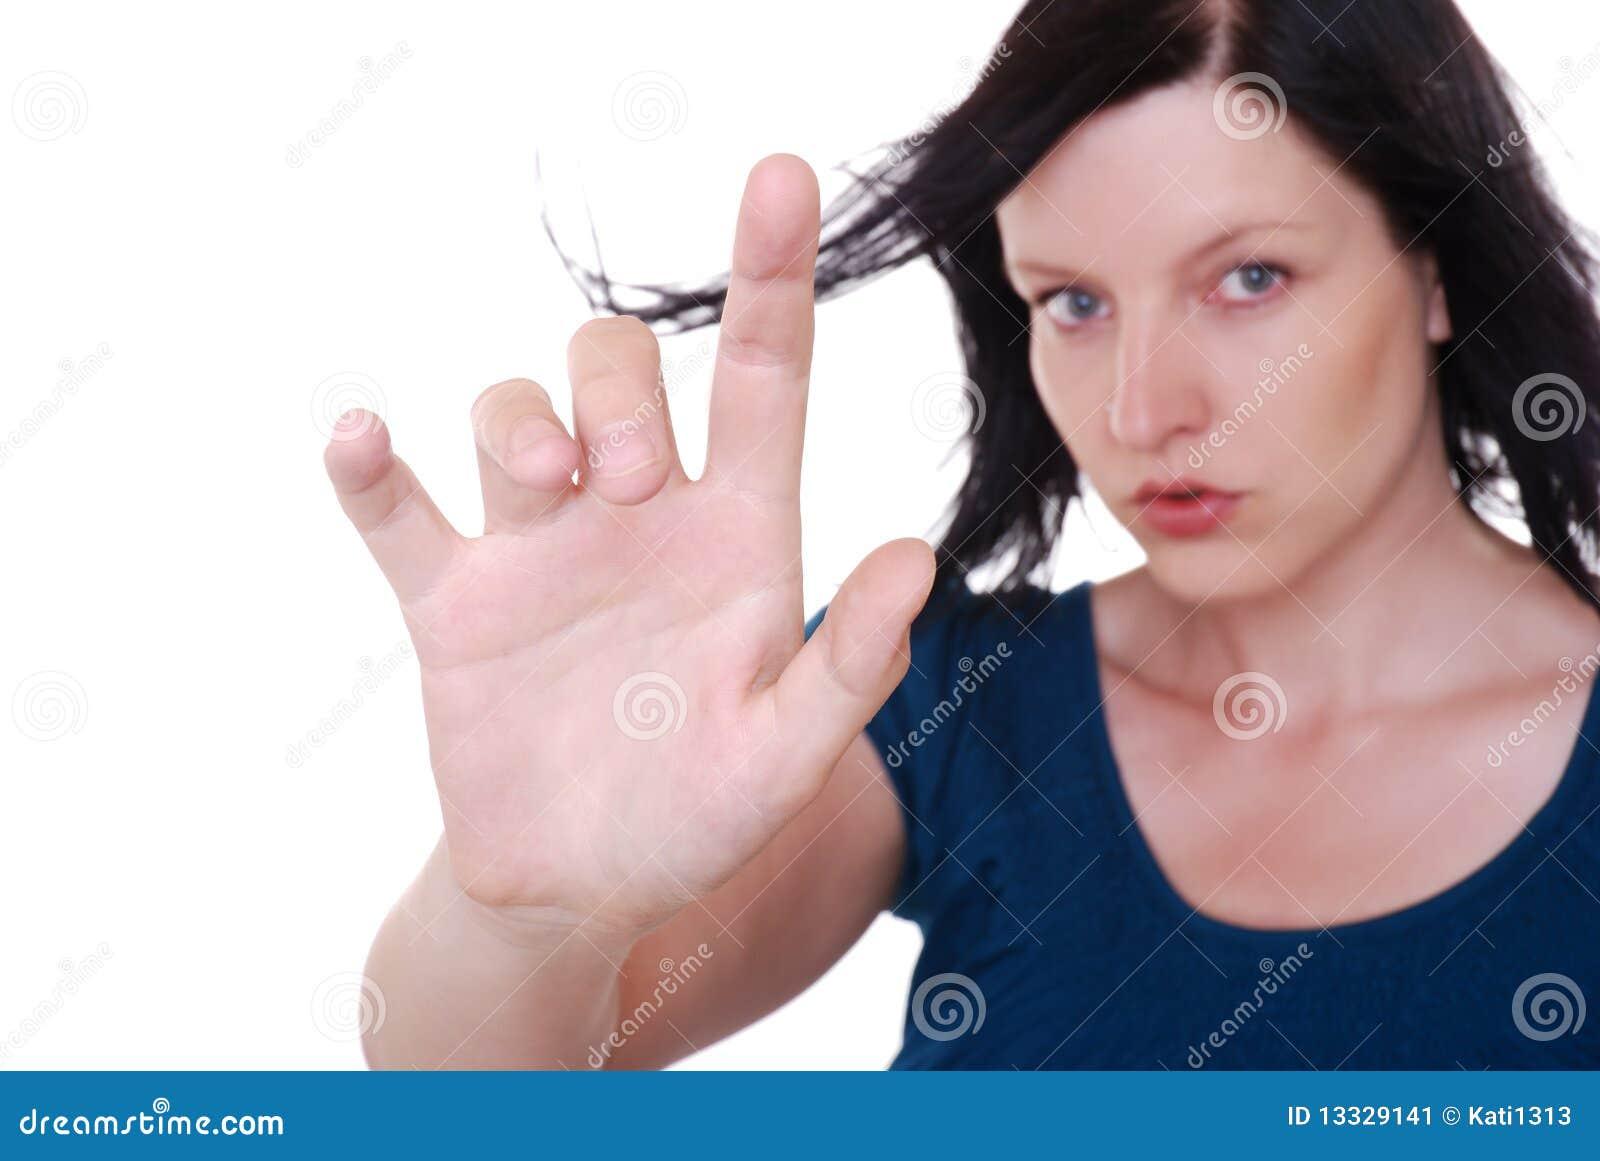 Punkt palcowa kobieta